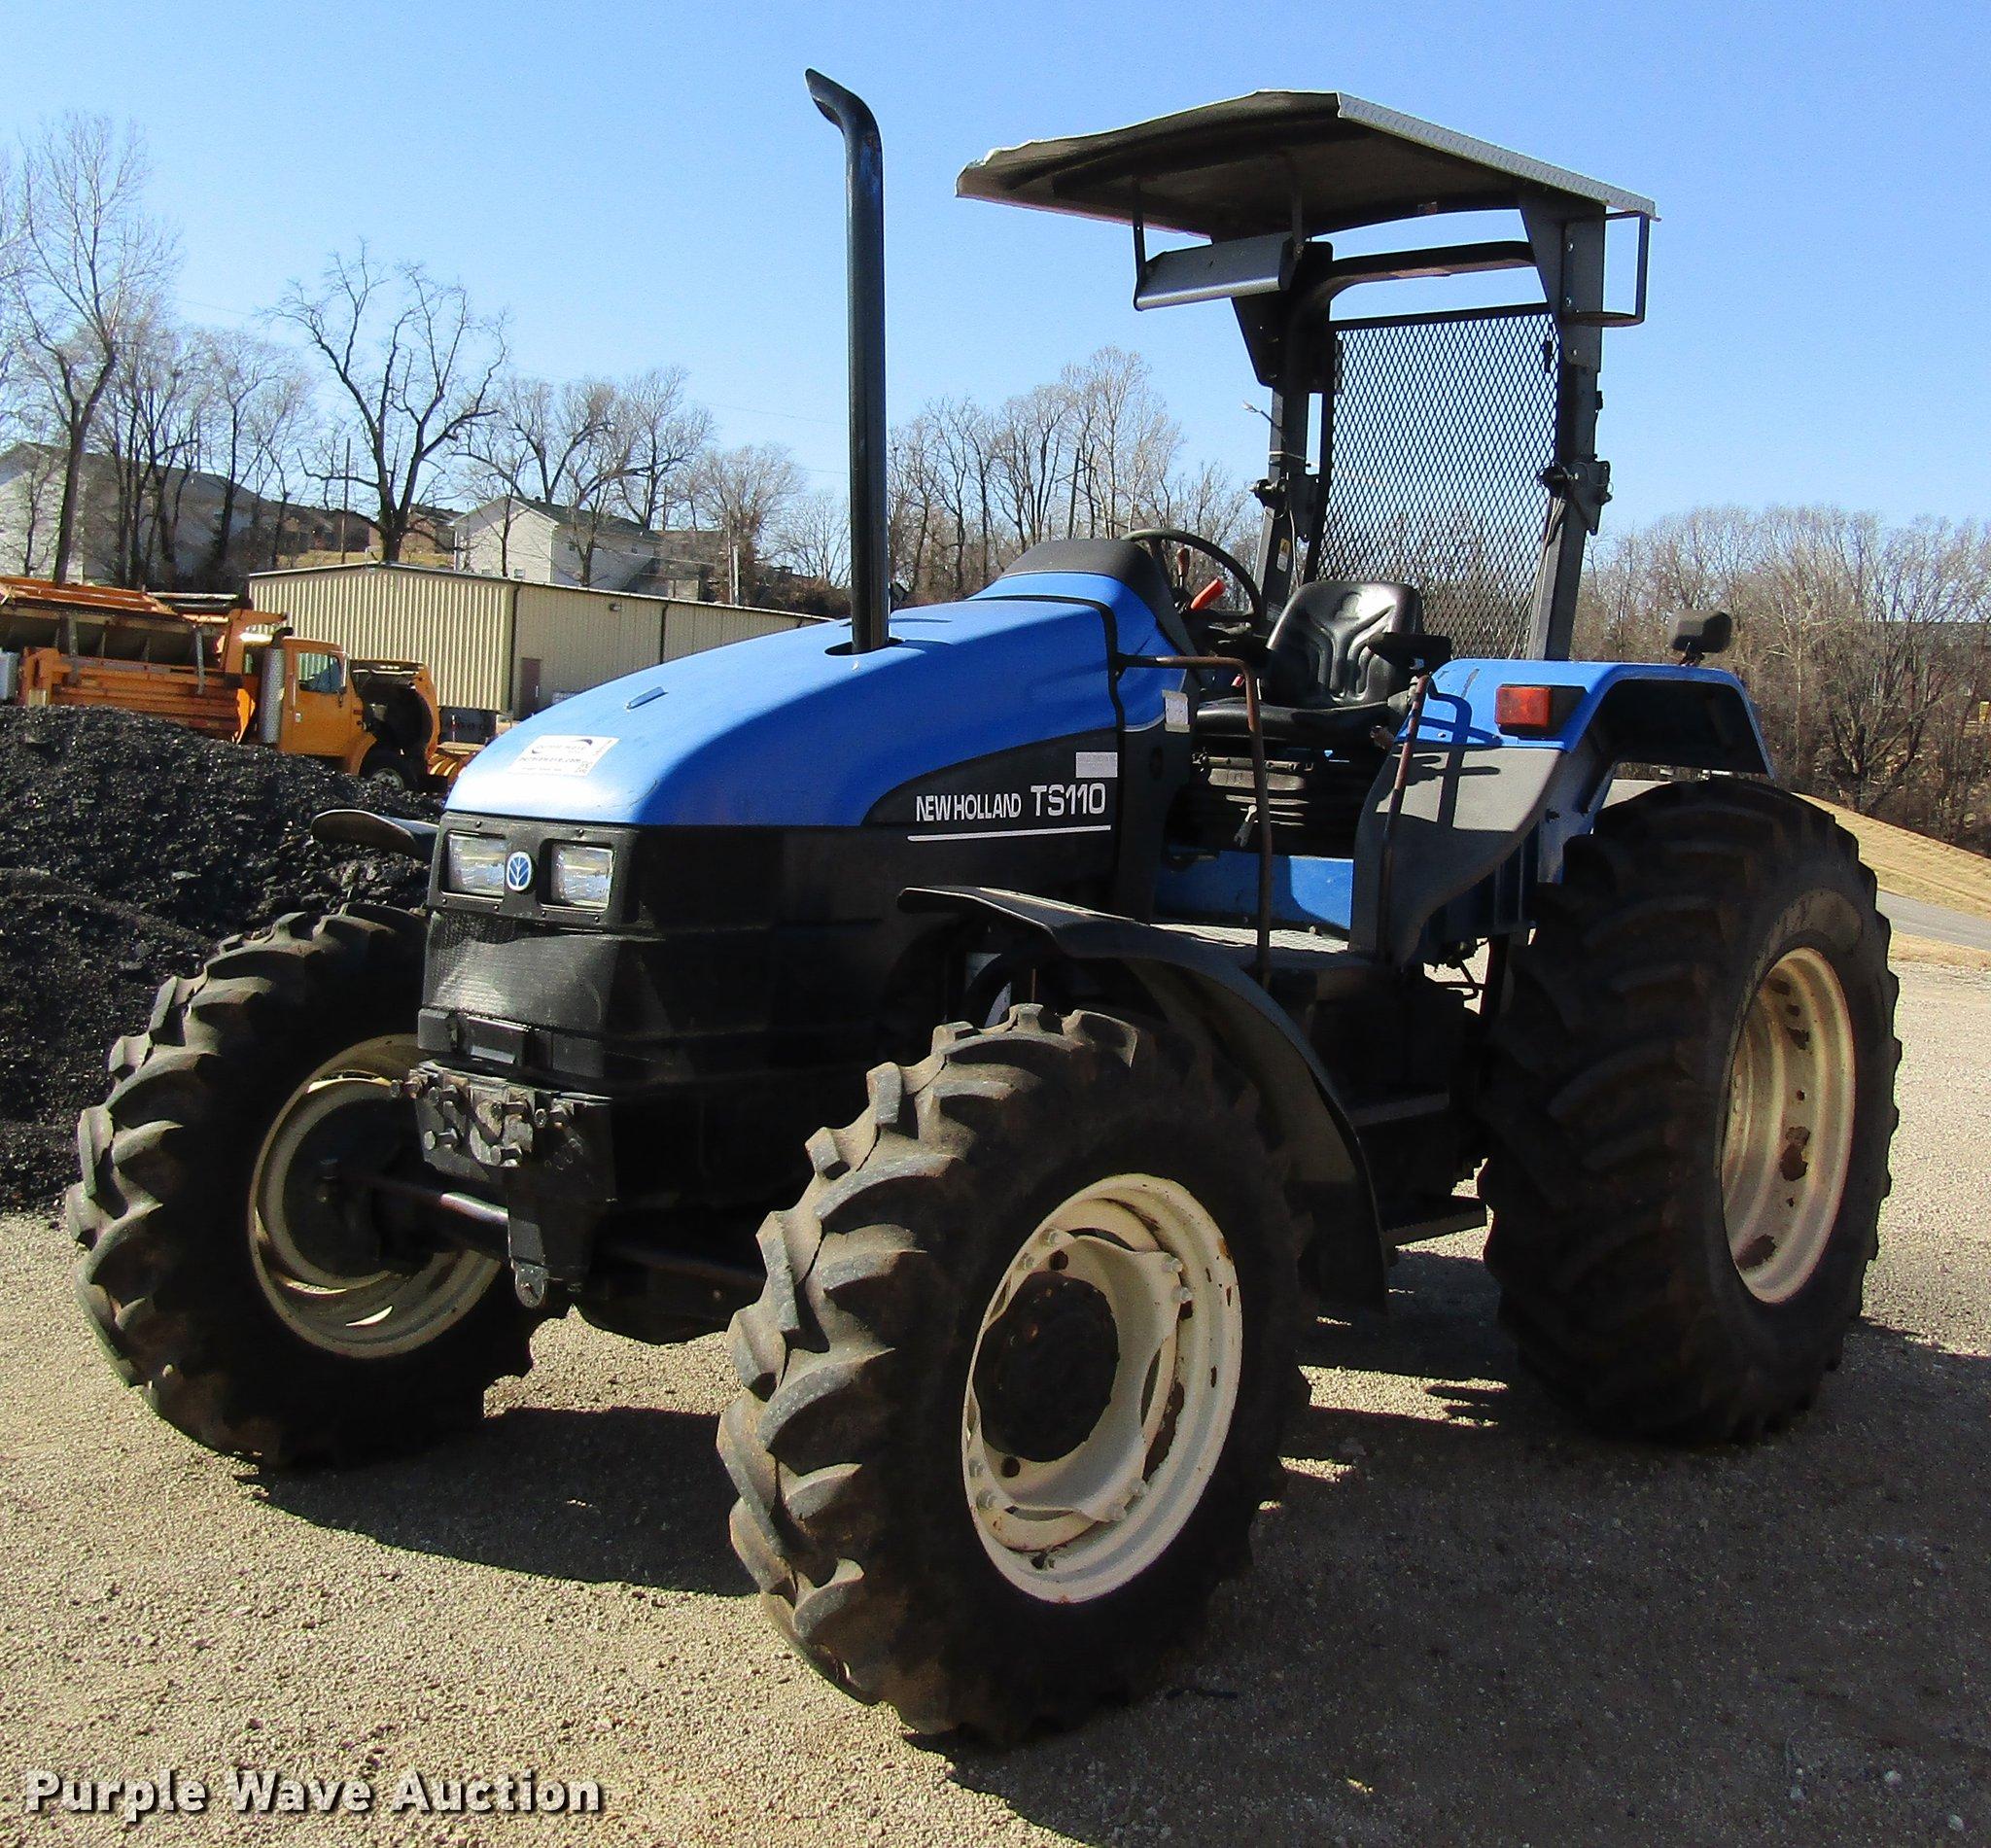 New Holland TS110 MFWD tractor | Item DB9798 | SOLD! Februar